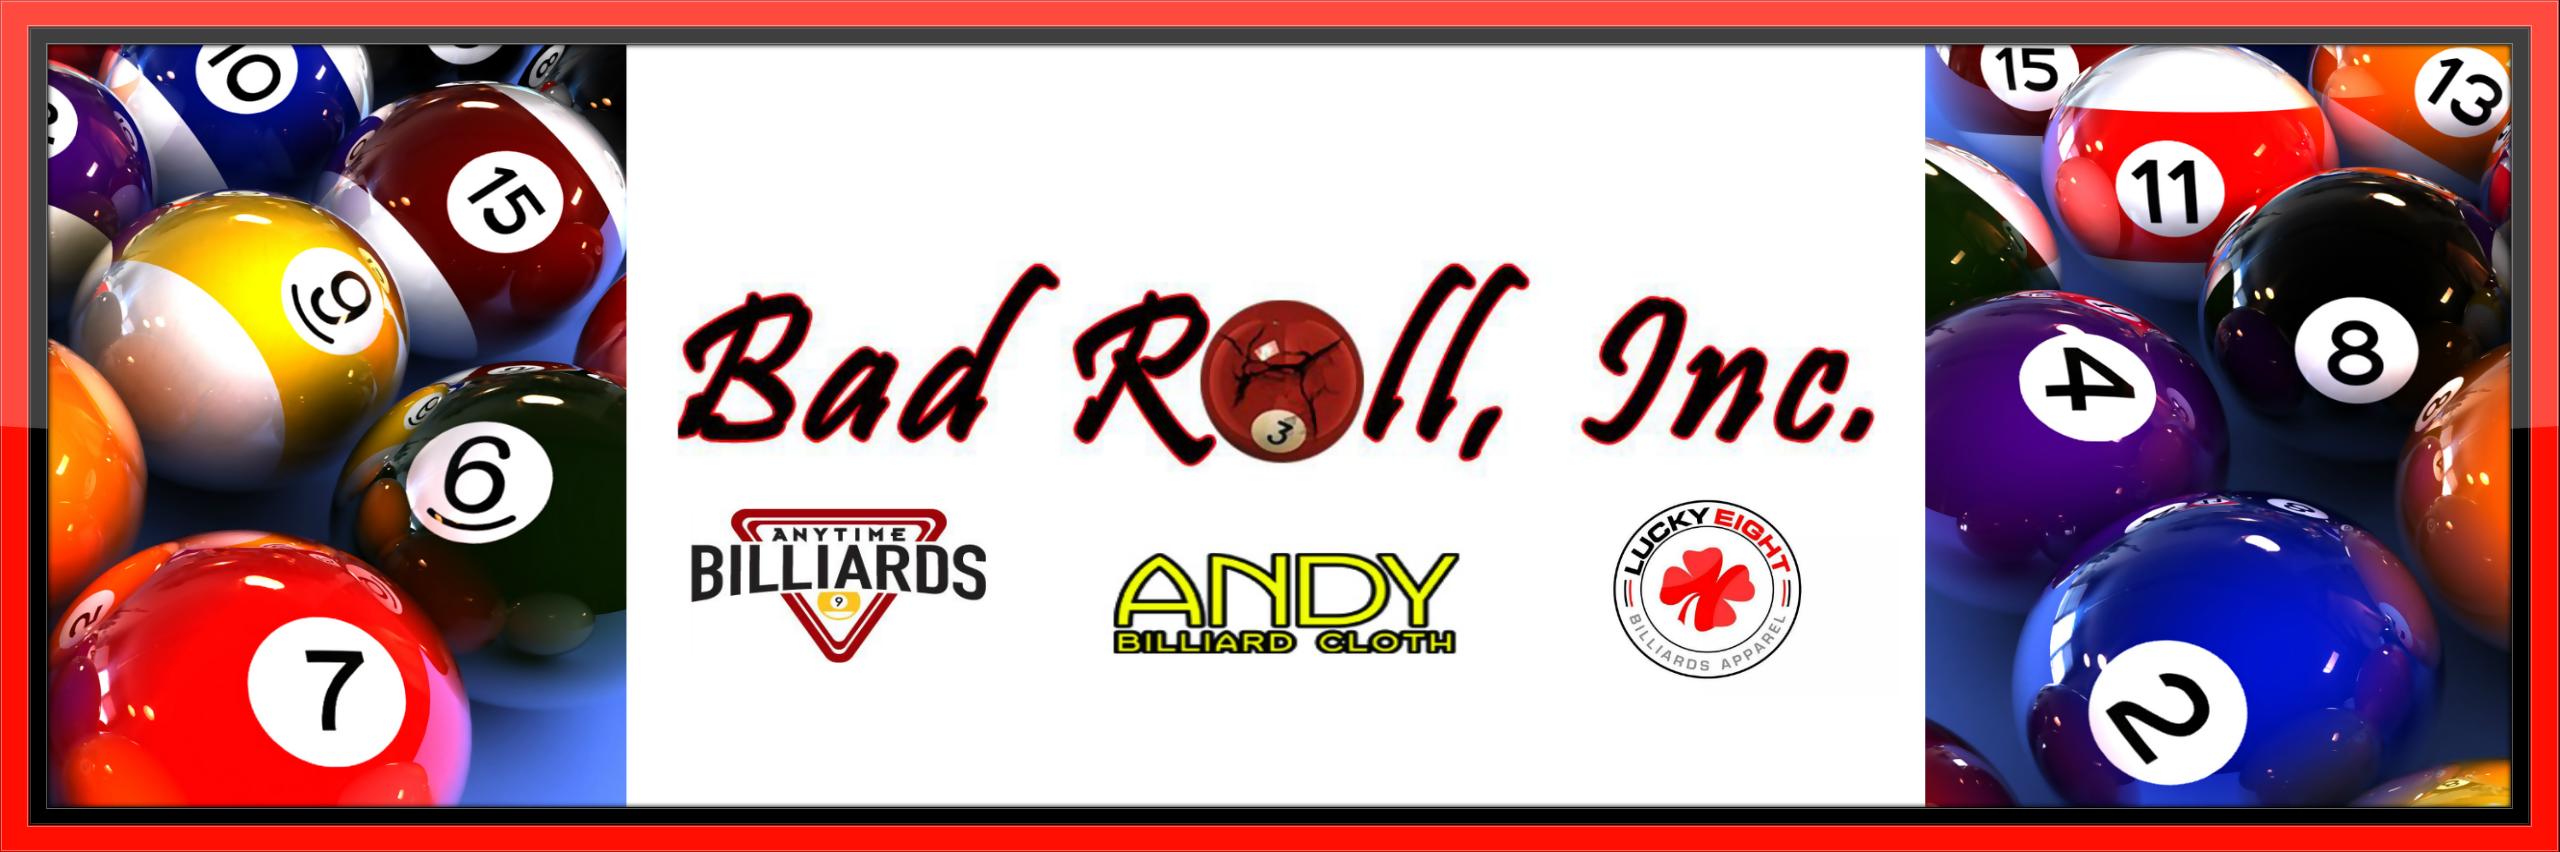 Bad Roll Inc